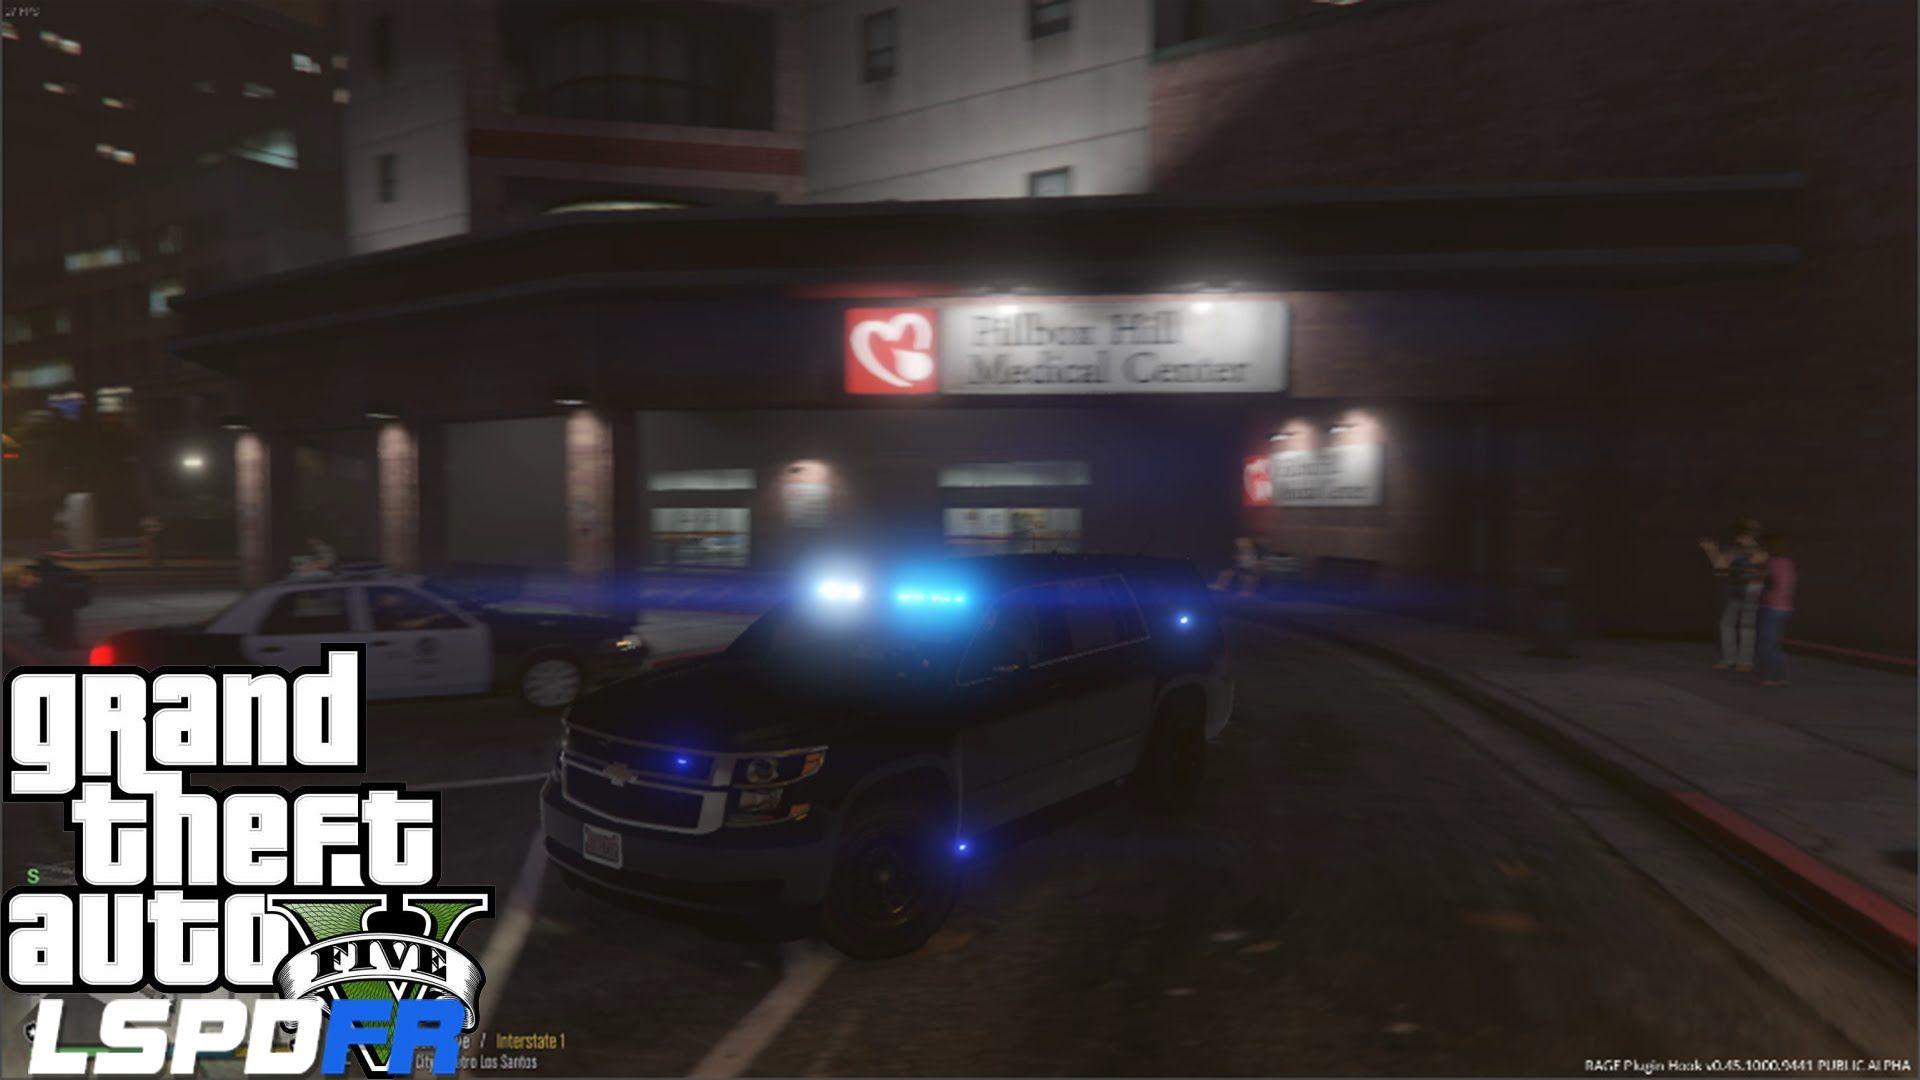 GTA LSPDFR - Episode 7 - WASTED   LSPDFR   Gta, Youtube